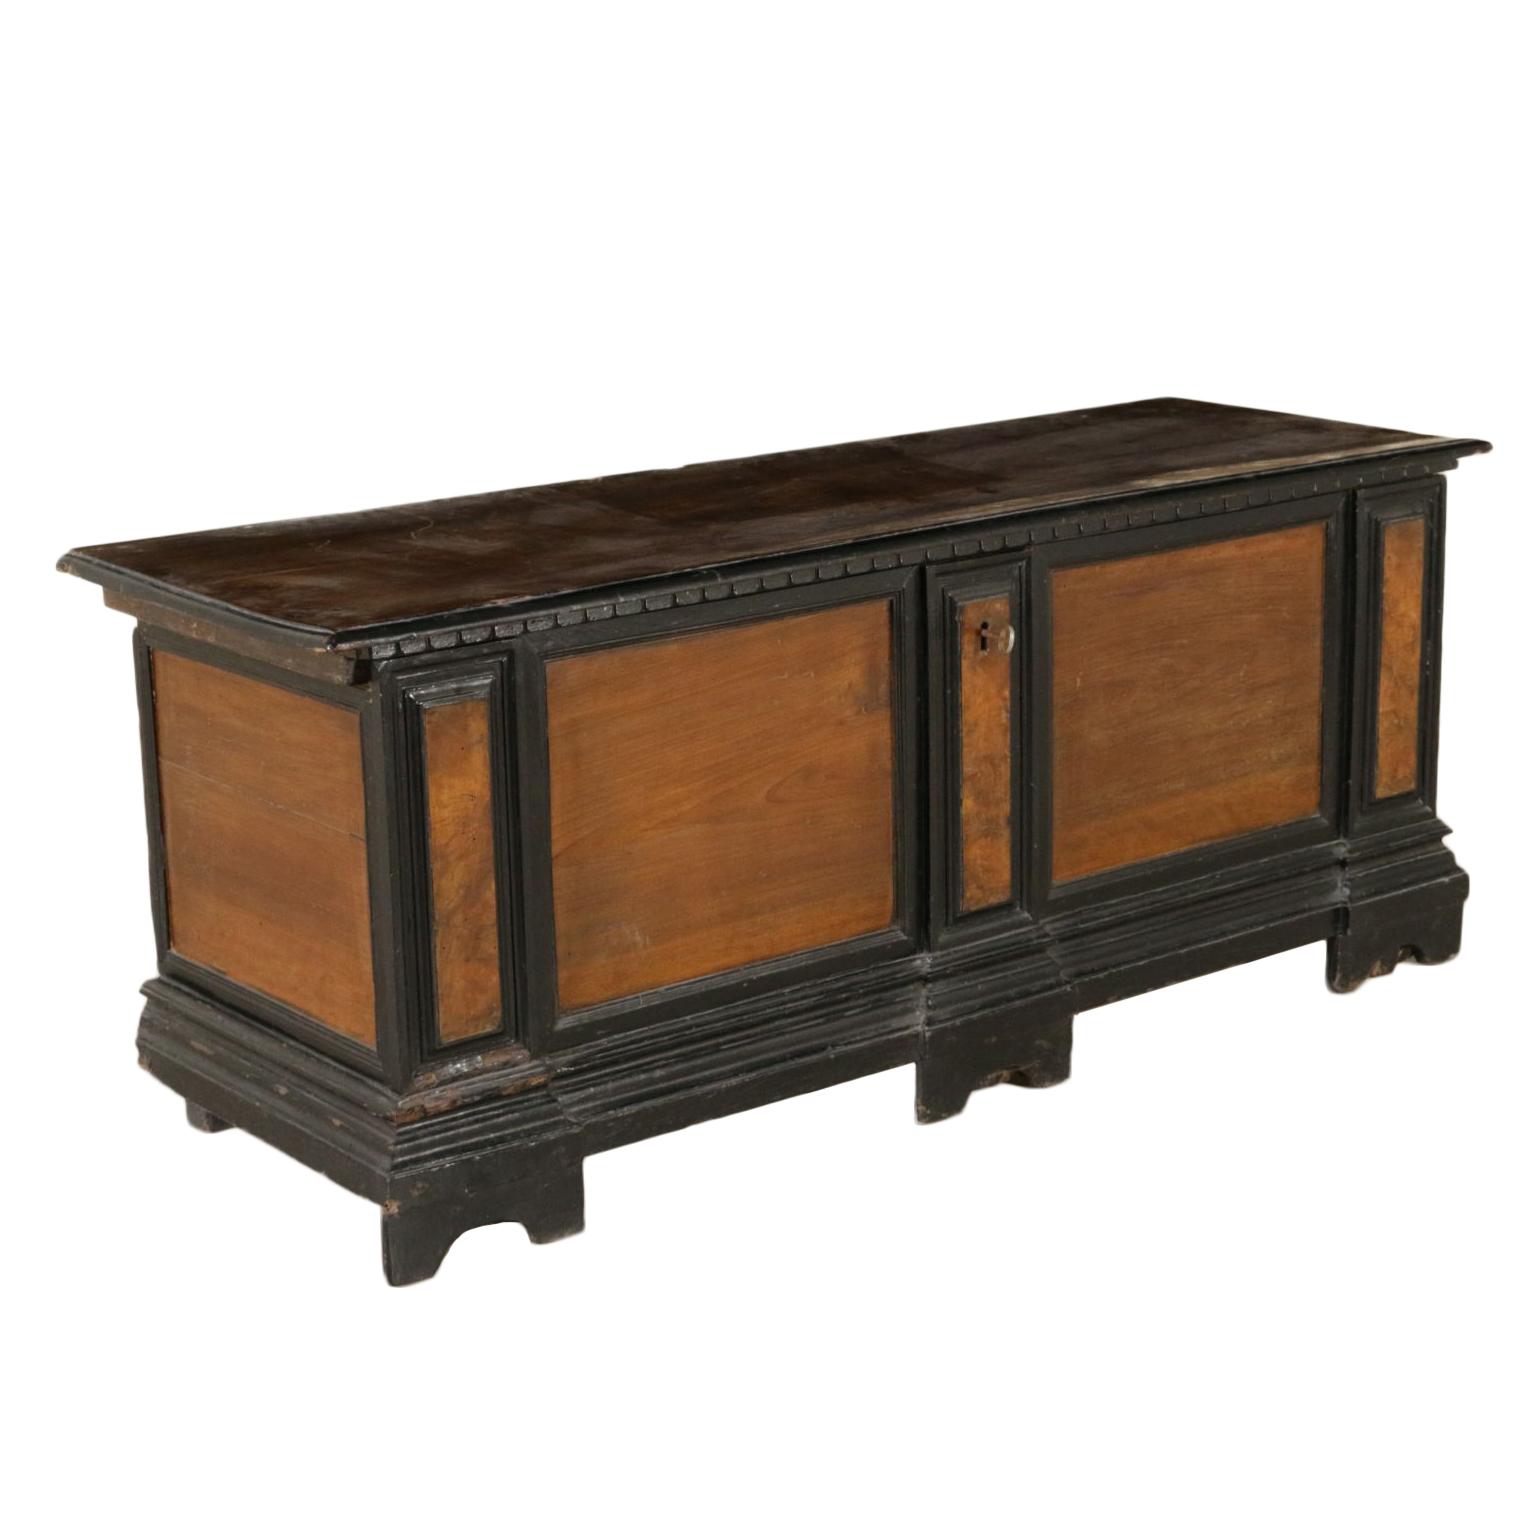 Cassapanca veneta altri mobili antiquariato for Mobili antiquariato